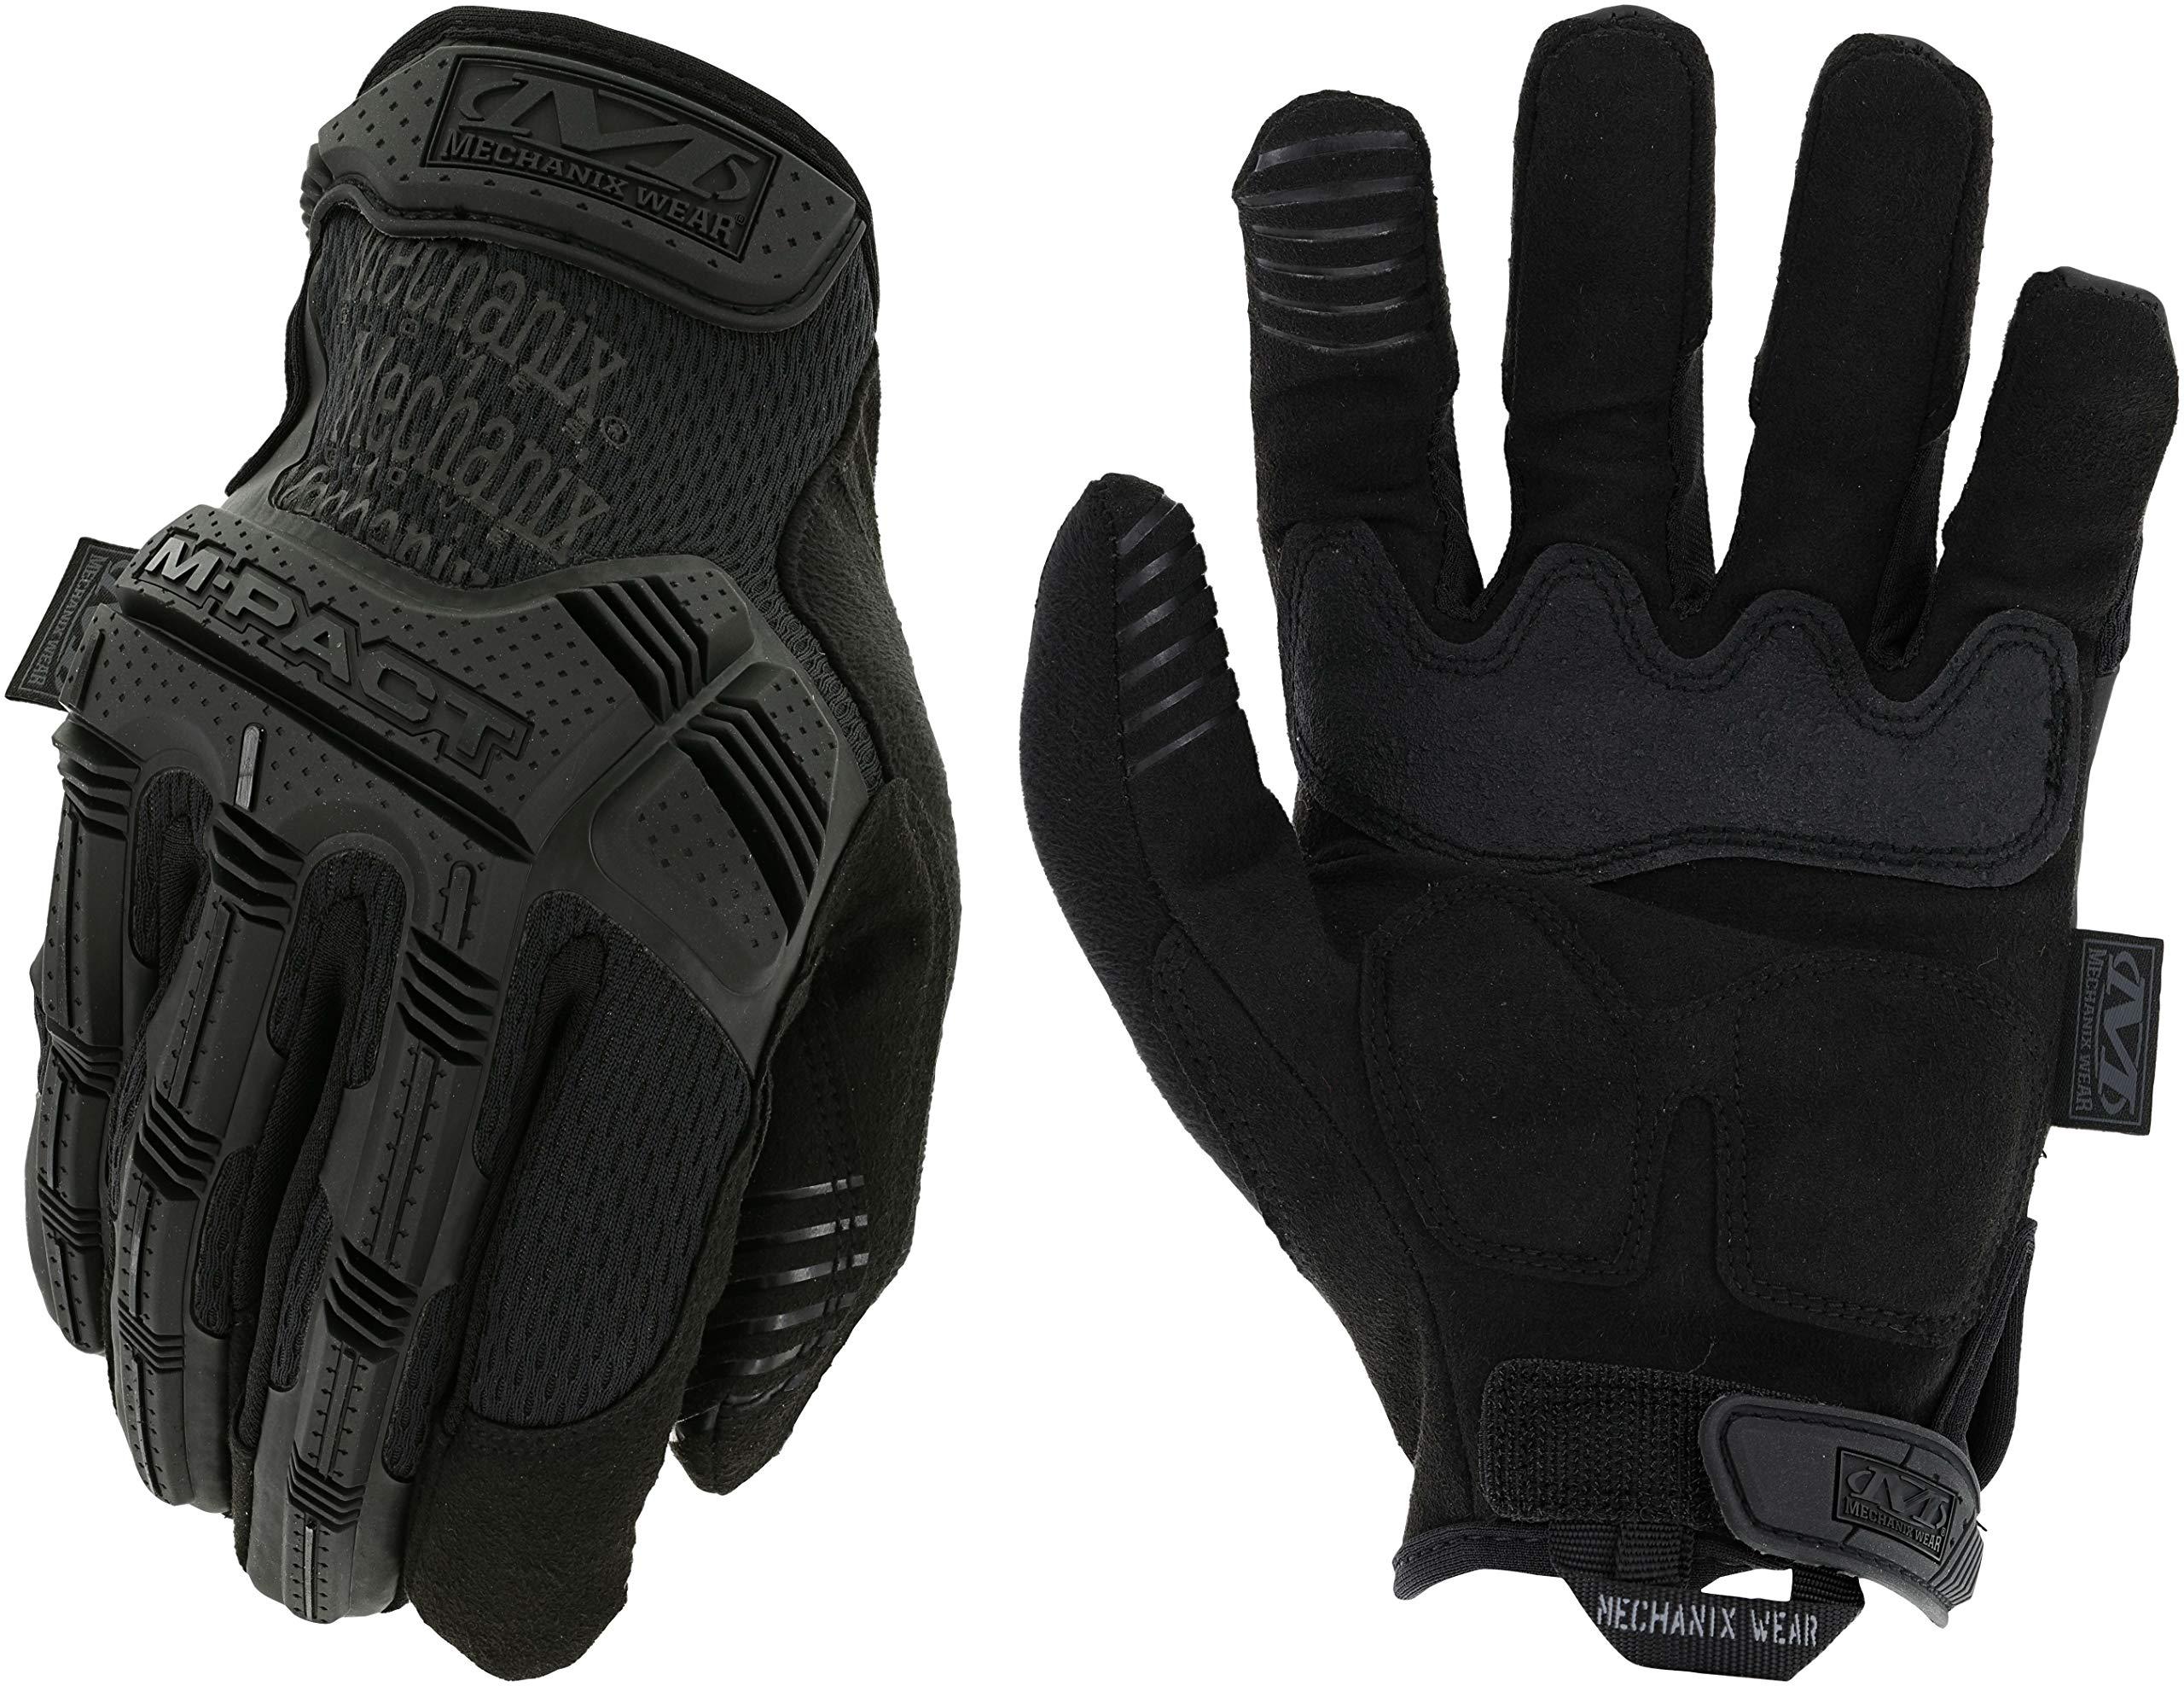 Mechanix Wear - M-Pact Covert Tactical Gloves (Small, Black)